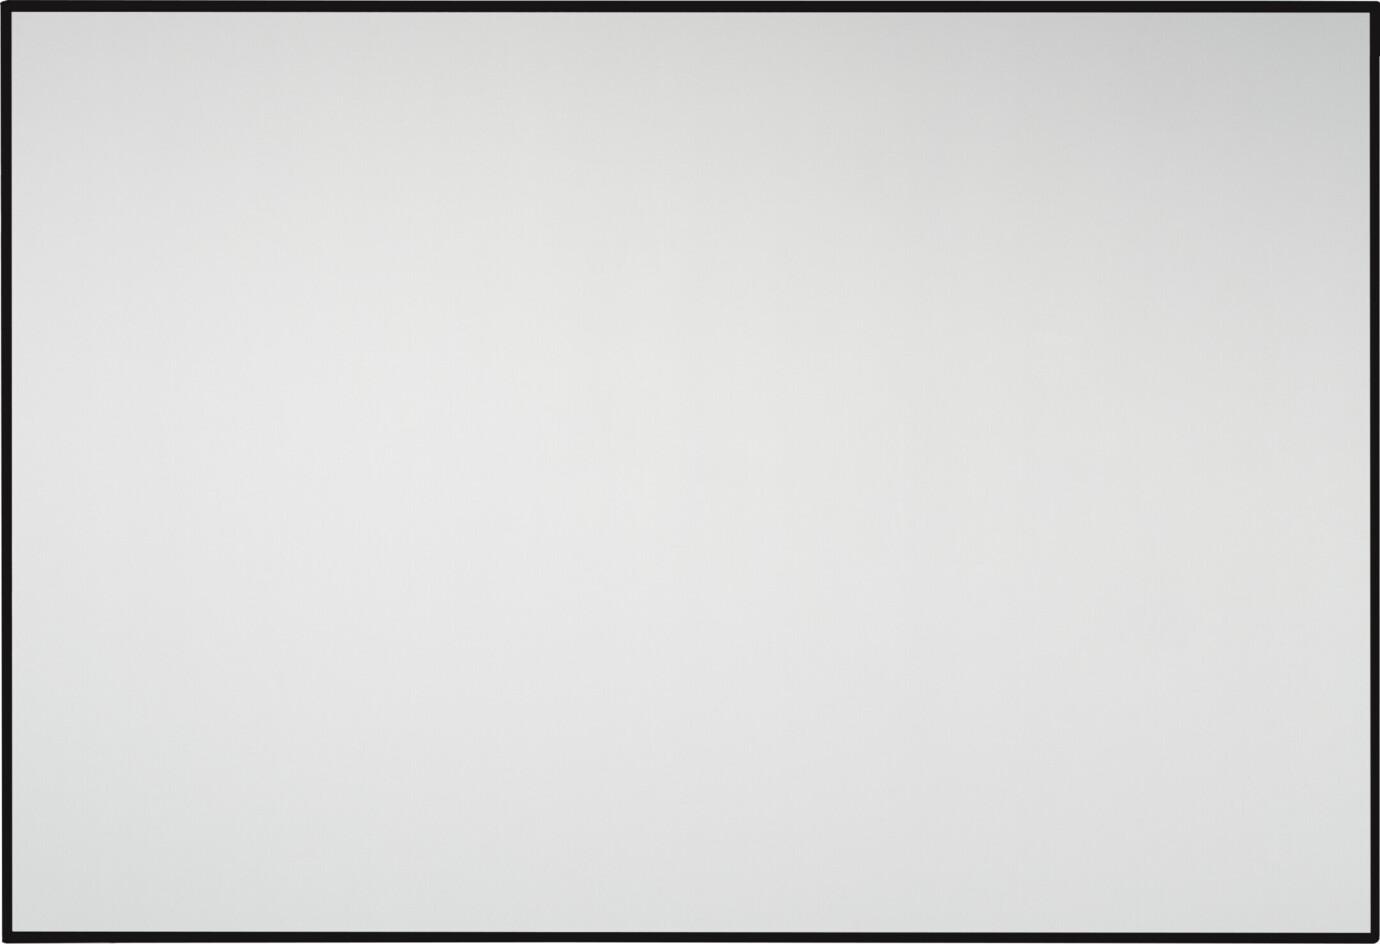 "celexon HomeCinema Hochkontrastleinwand Frame 300 x 169 cm, 135"" - Dynamic Slate ALR"